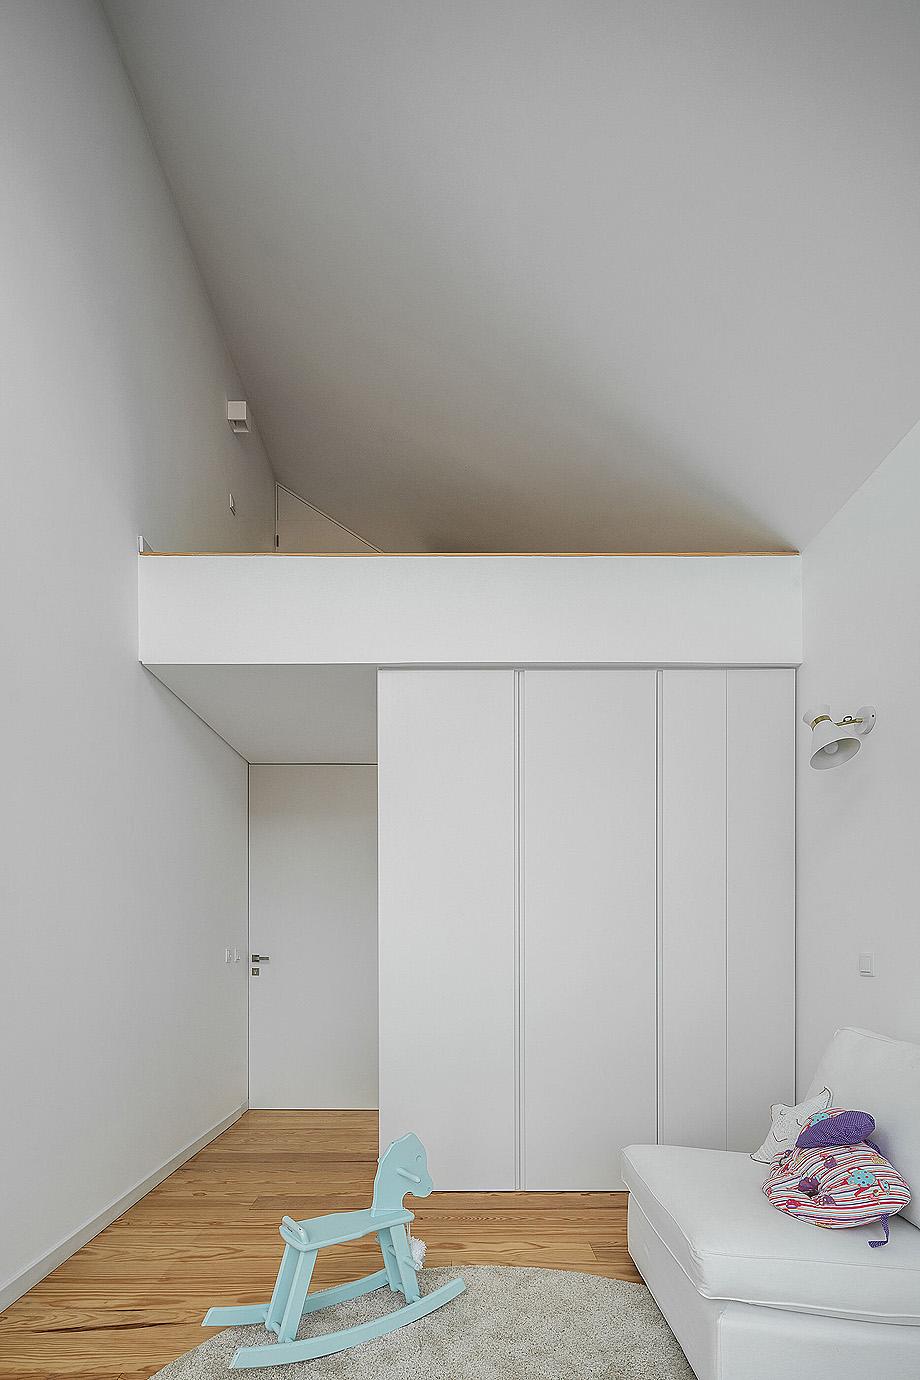 casa do arco de frari architecture network - foto ivo tavares (25)